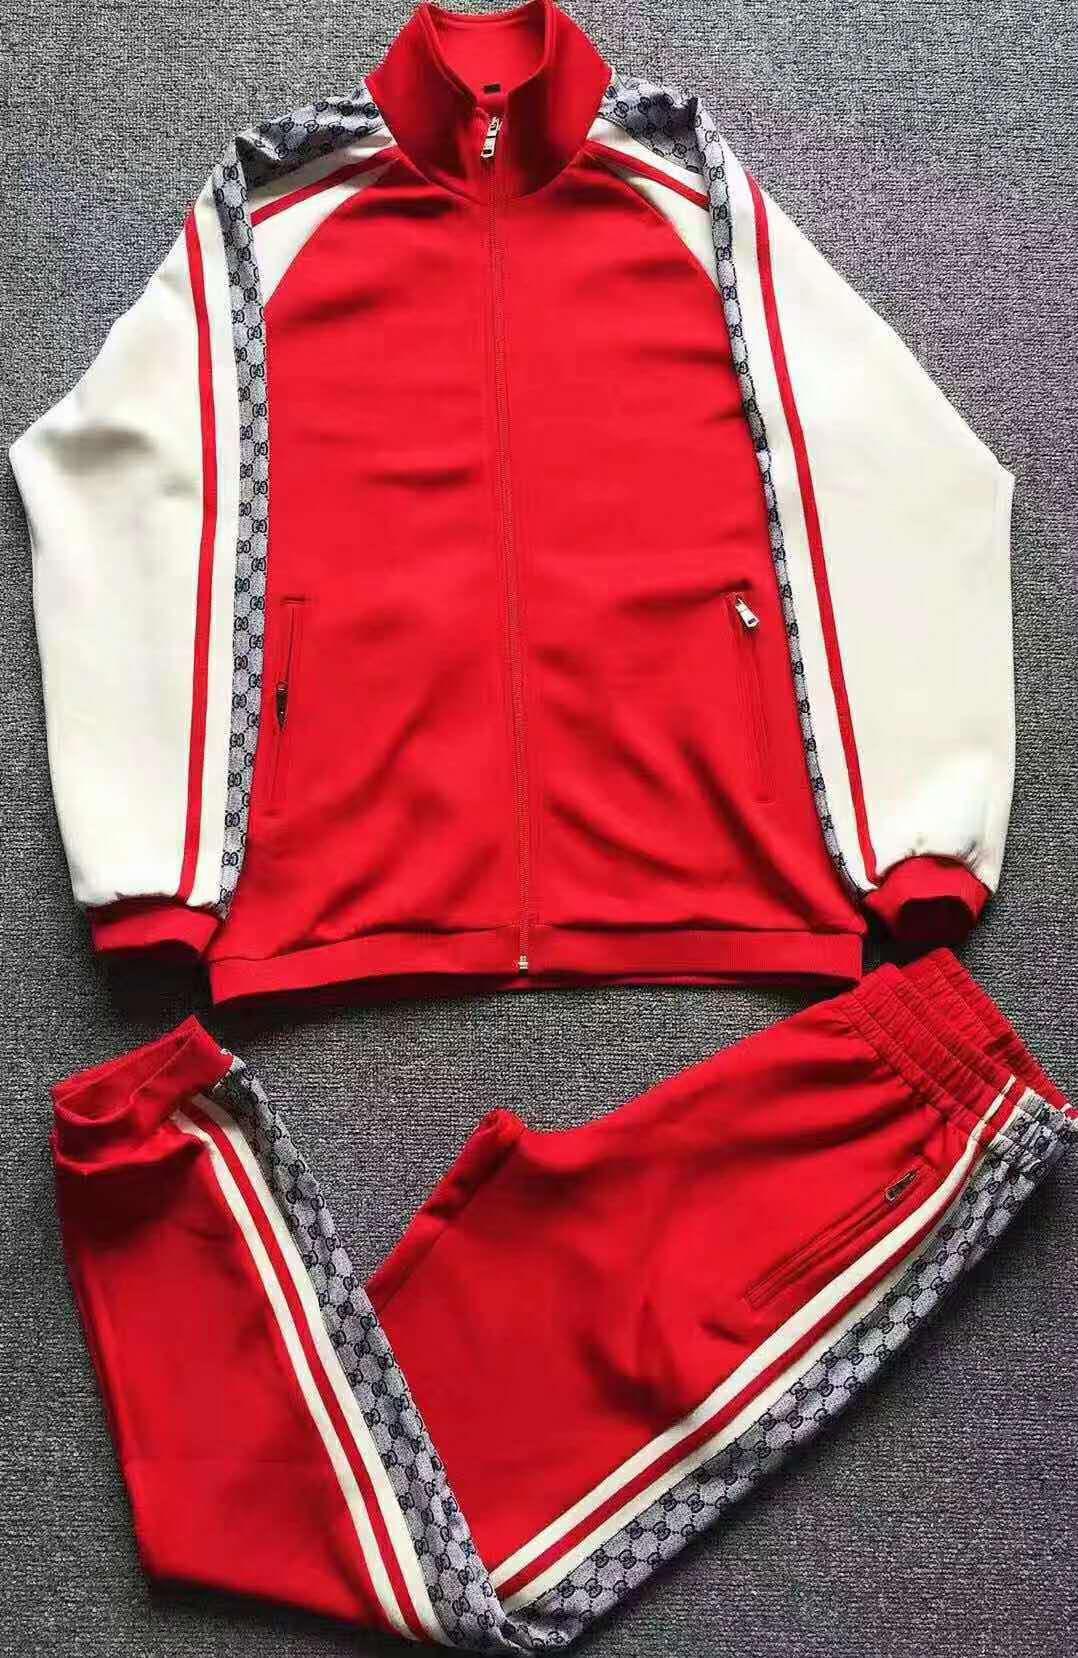 2019 Men's Tracksuits Sweatshirts Sweat Suits Men Hoodies Tracksuit Jackets Sets Medusa Sportswear Luxury Sports Suit